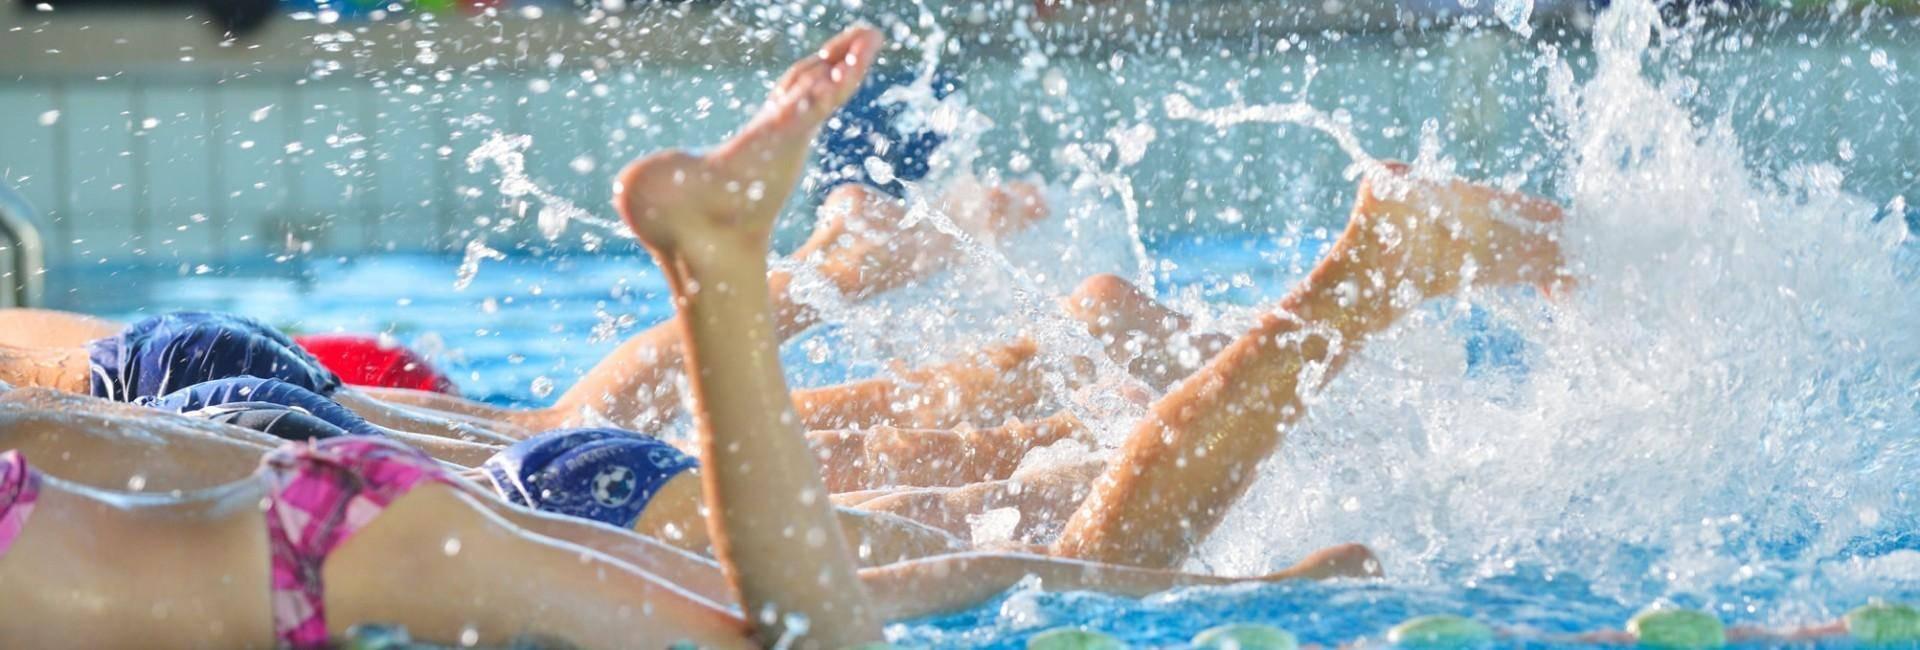 Zwemschool Haarlem - zuid